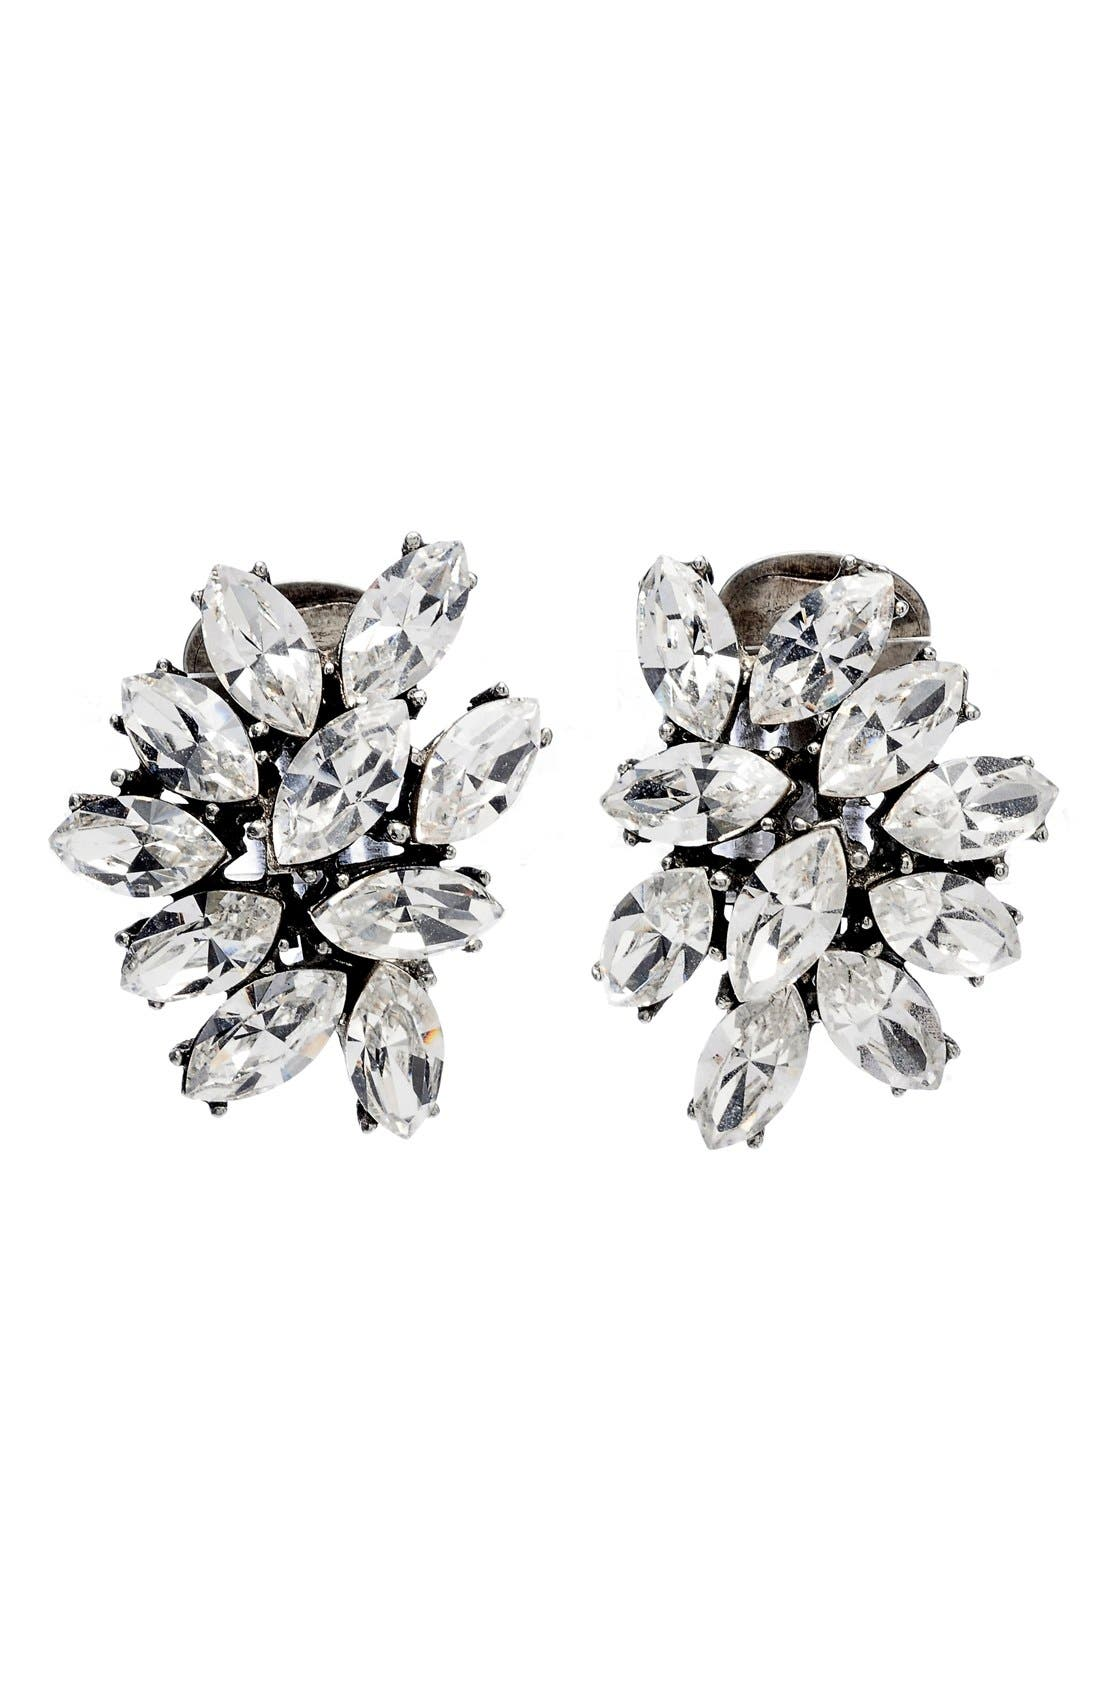 Main Image - Ben-Amun Swarovski Crystal Cluster Clip Earrings